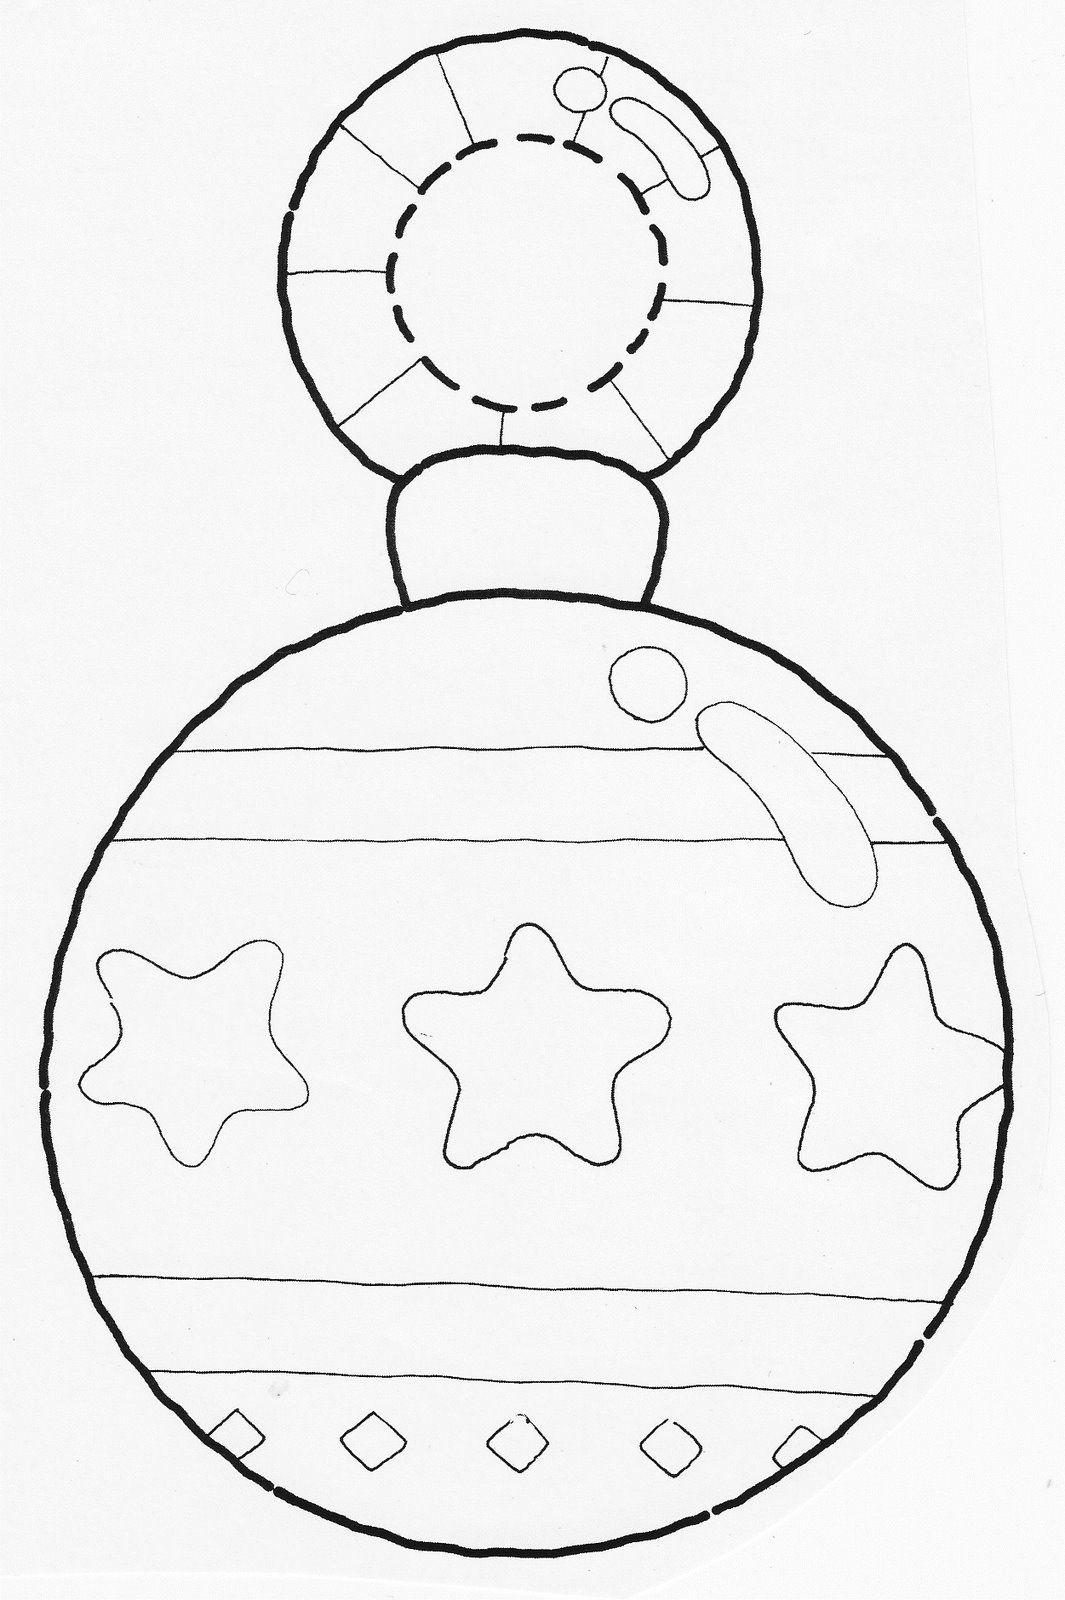 Menta m s chocolate recursos para educaci n infantil - Manualidades de navidad para ninos de preescolar ...